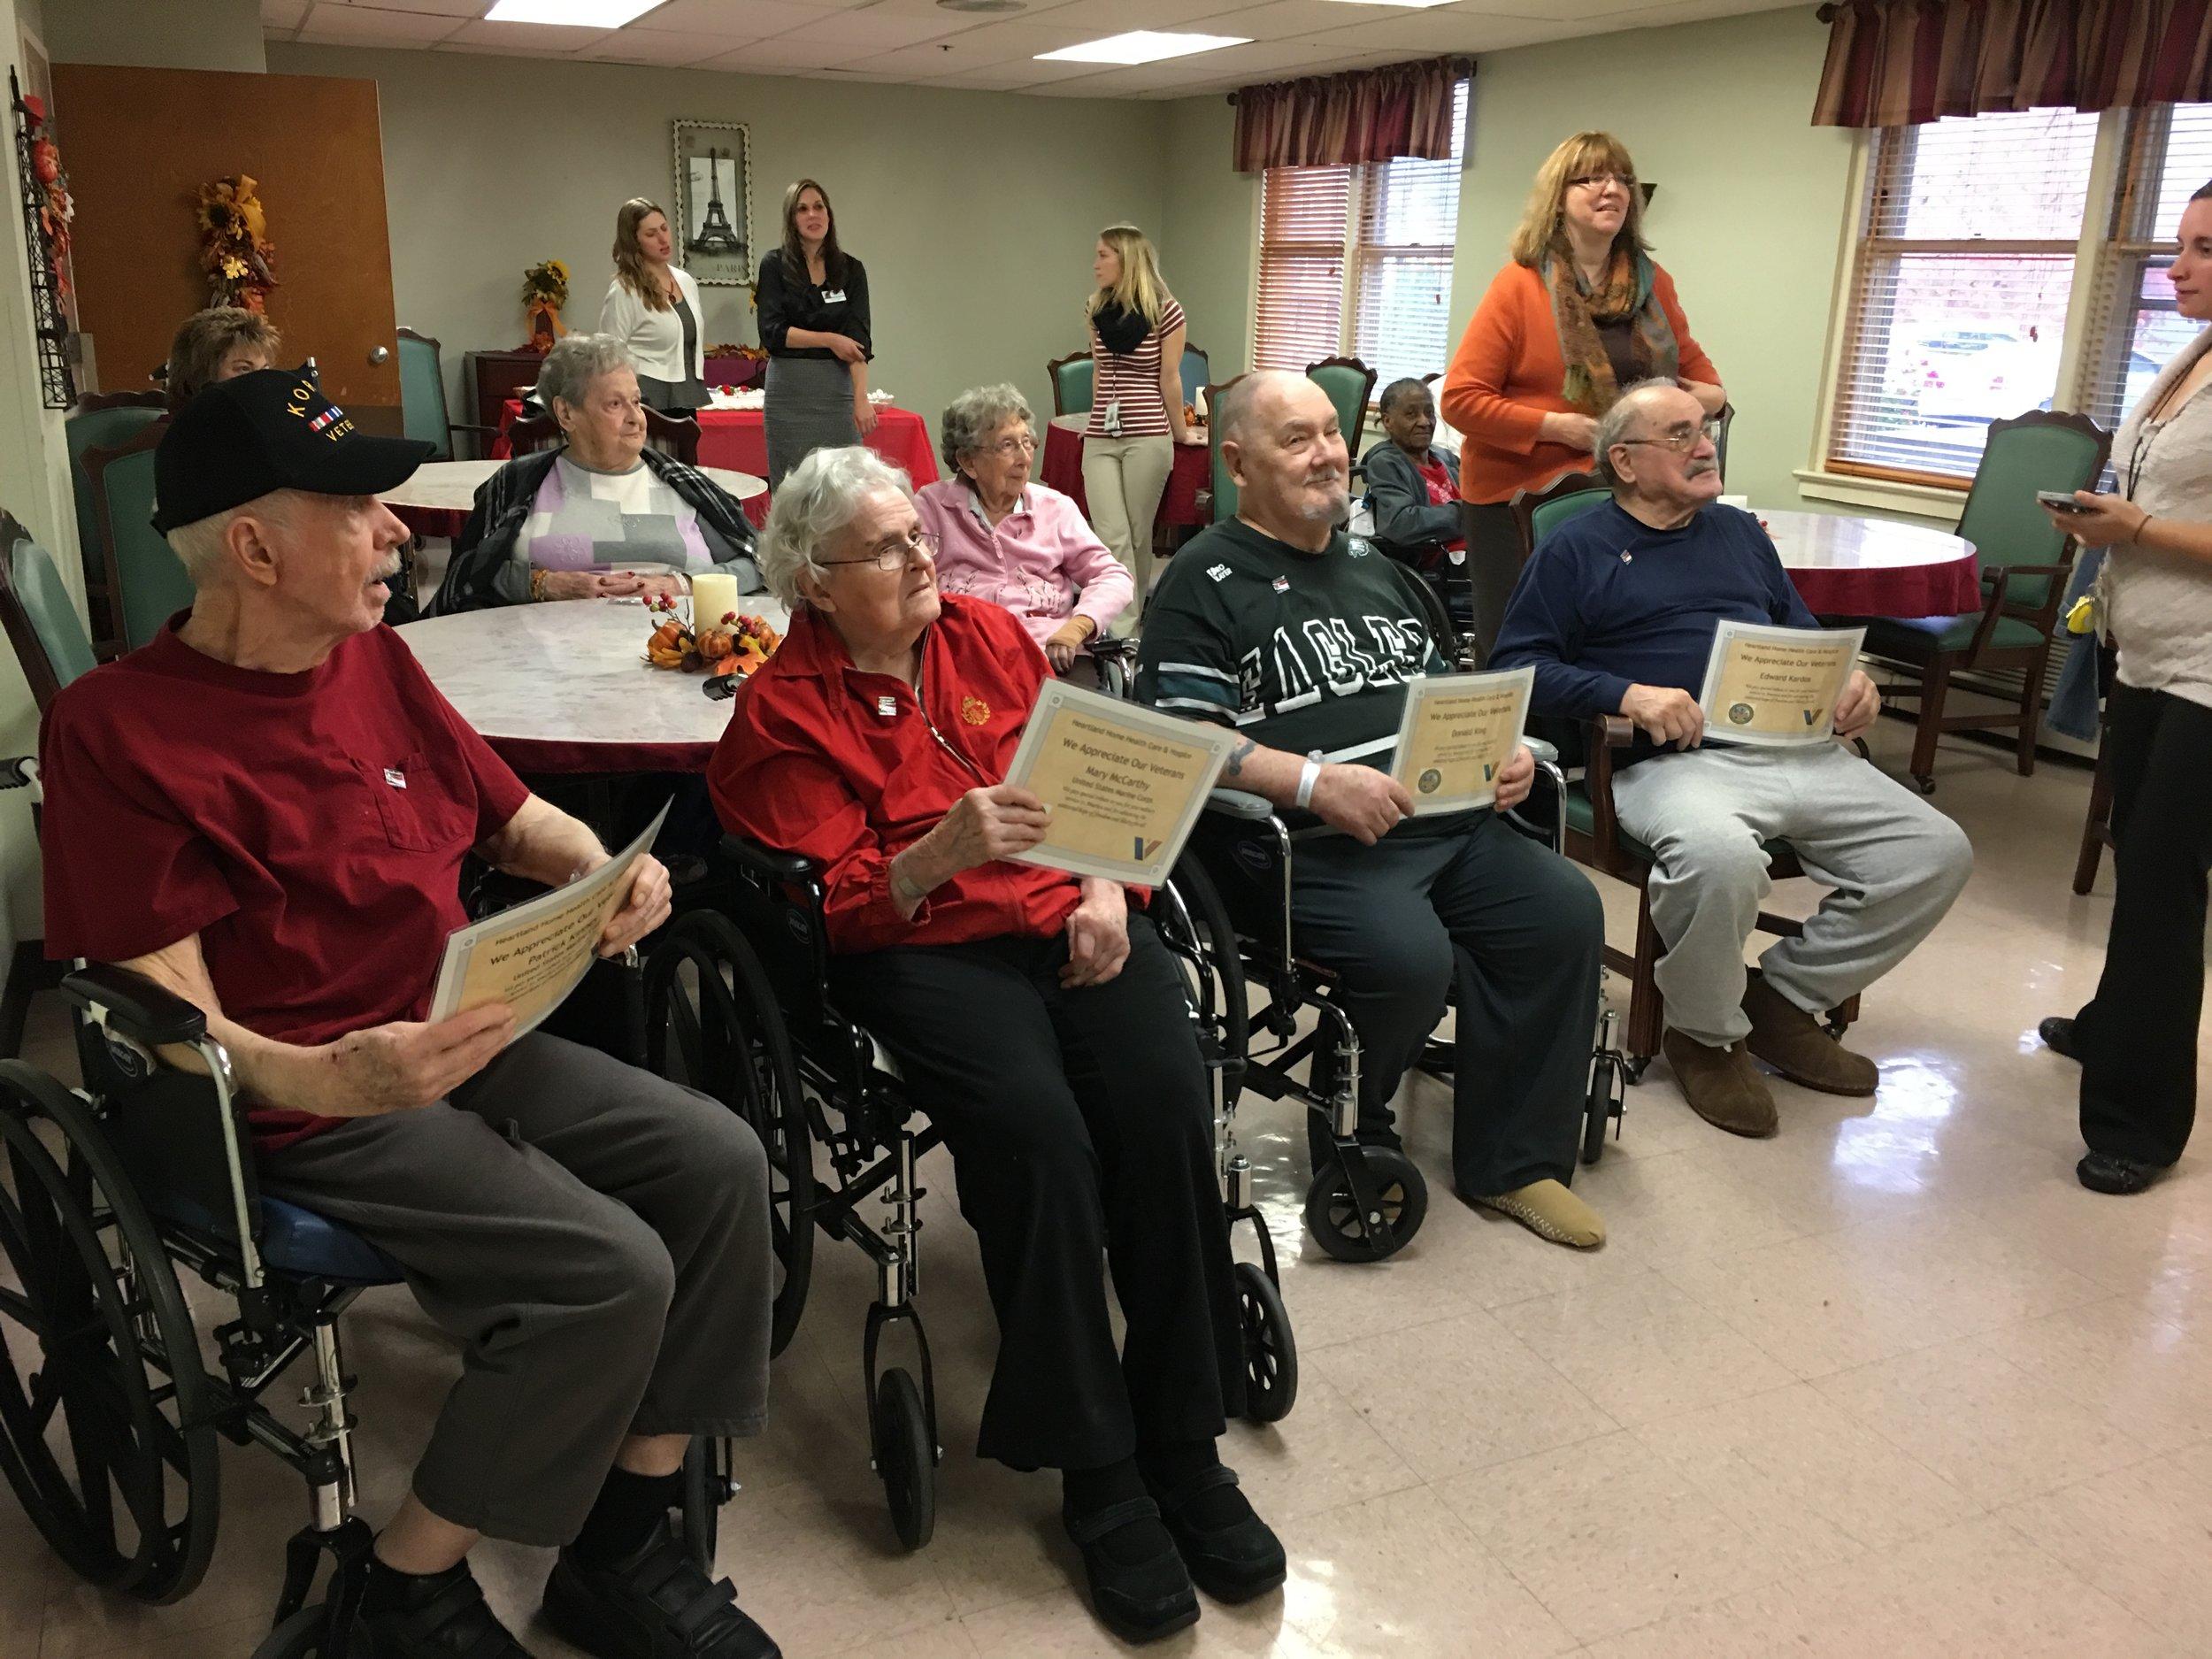 Blough Nursing Home Visist 11-9-16